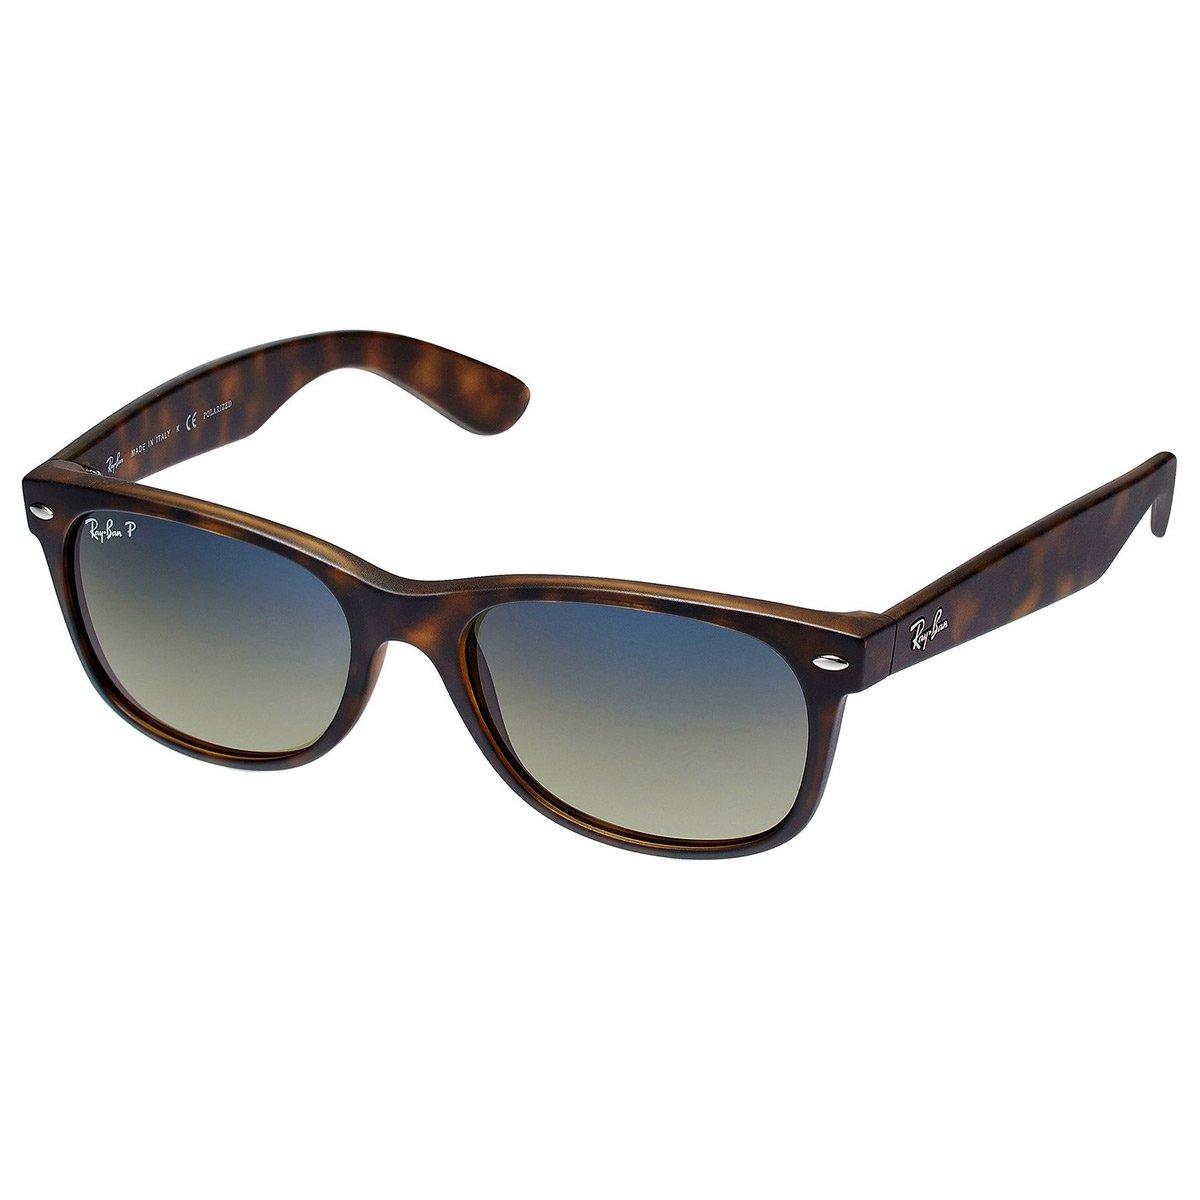 0eae0c2105 Amazon.com  Ray Ban Wayfarer RB2132 Polarized Sunglasses 894 76 ...